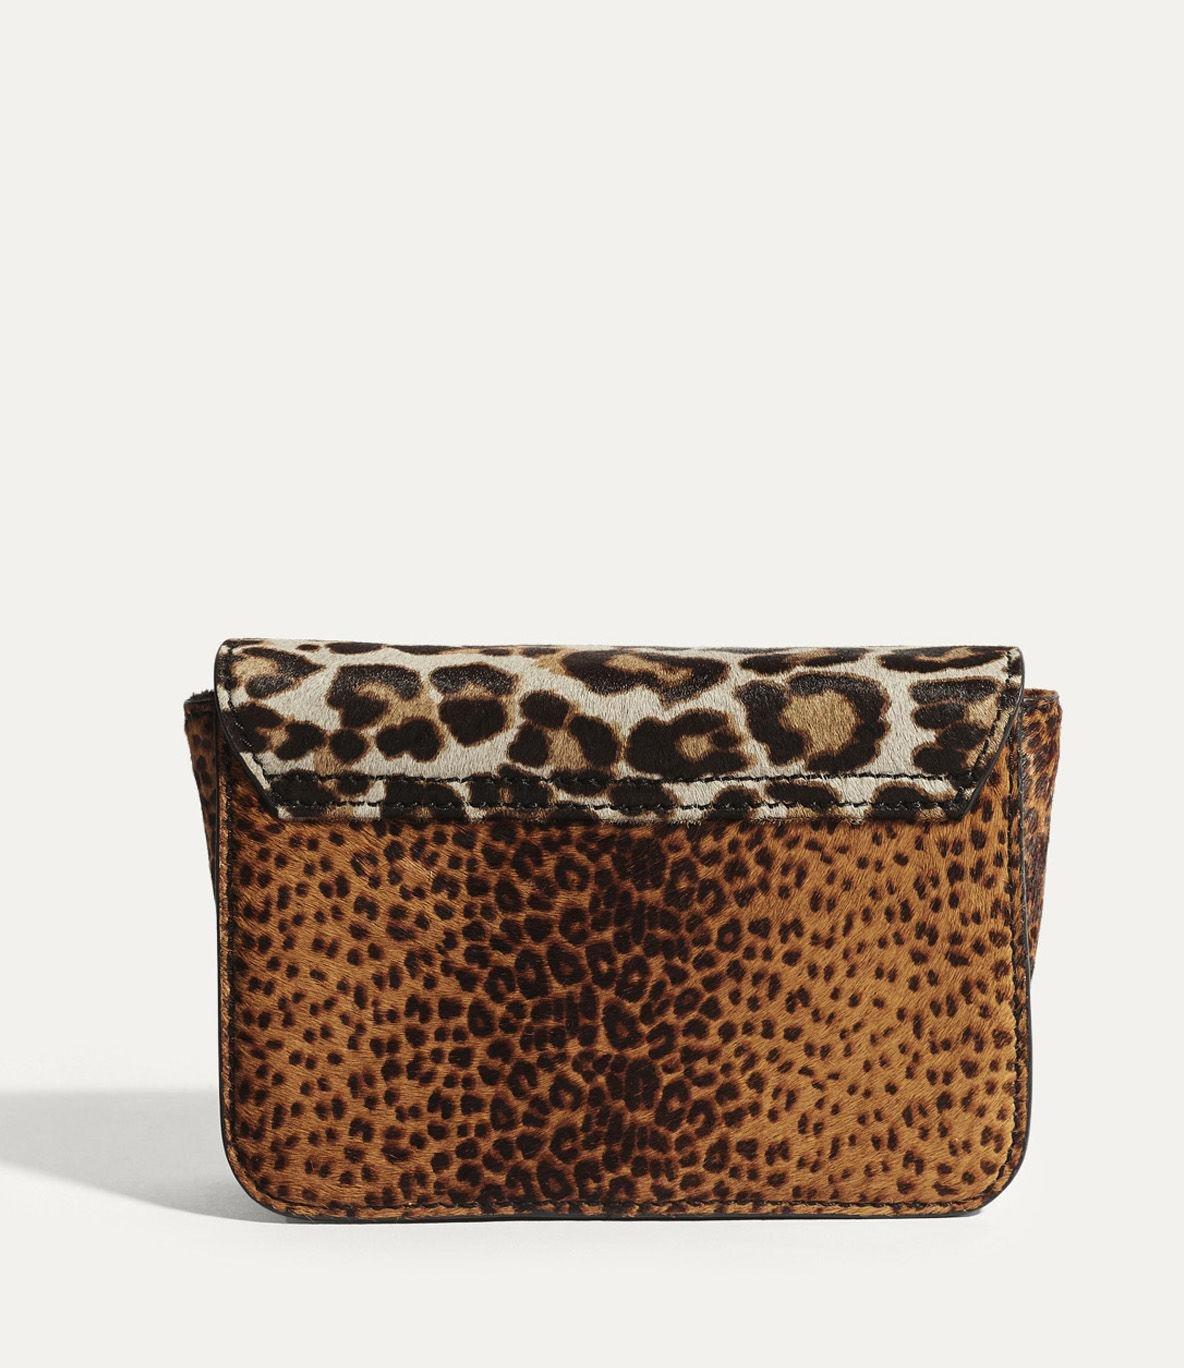 3a414fb72b4 Karen Millen Leopard Cross Body Bag - Leopard Print in Brown - Lyst